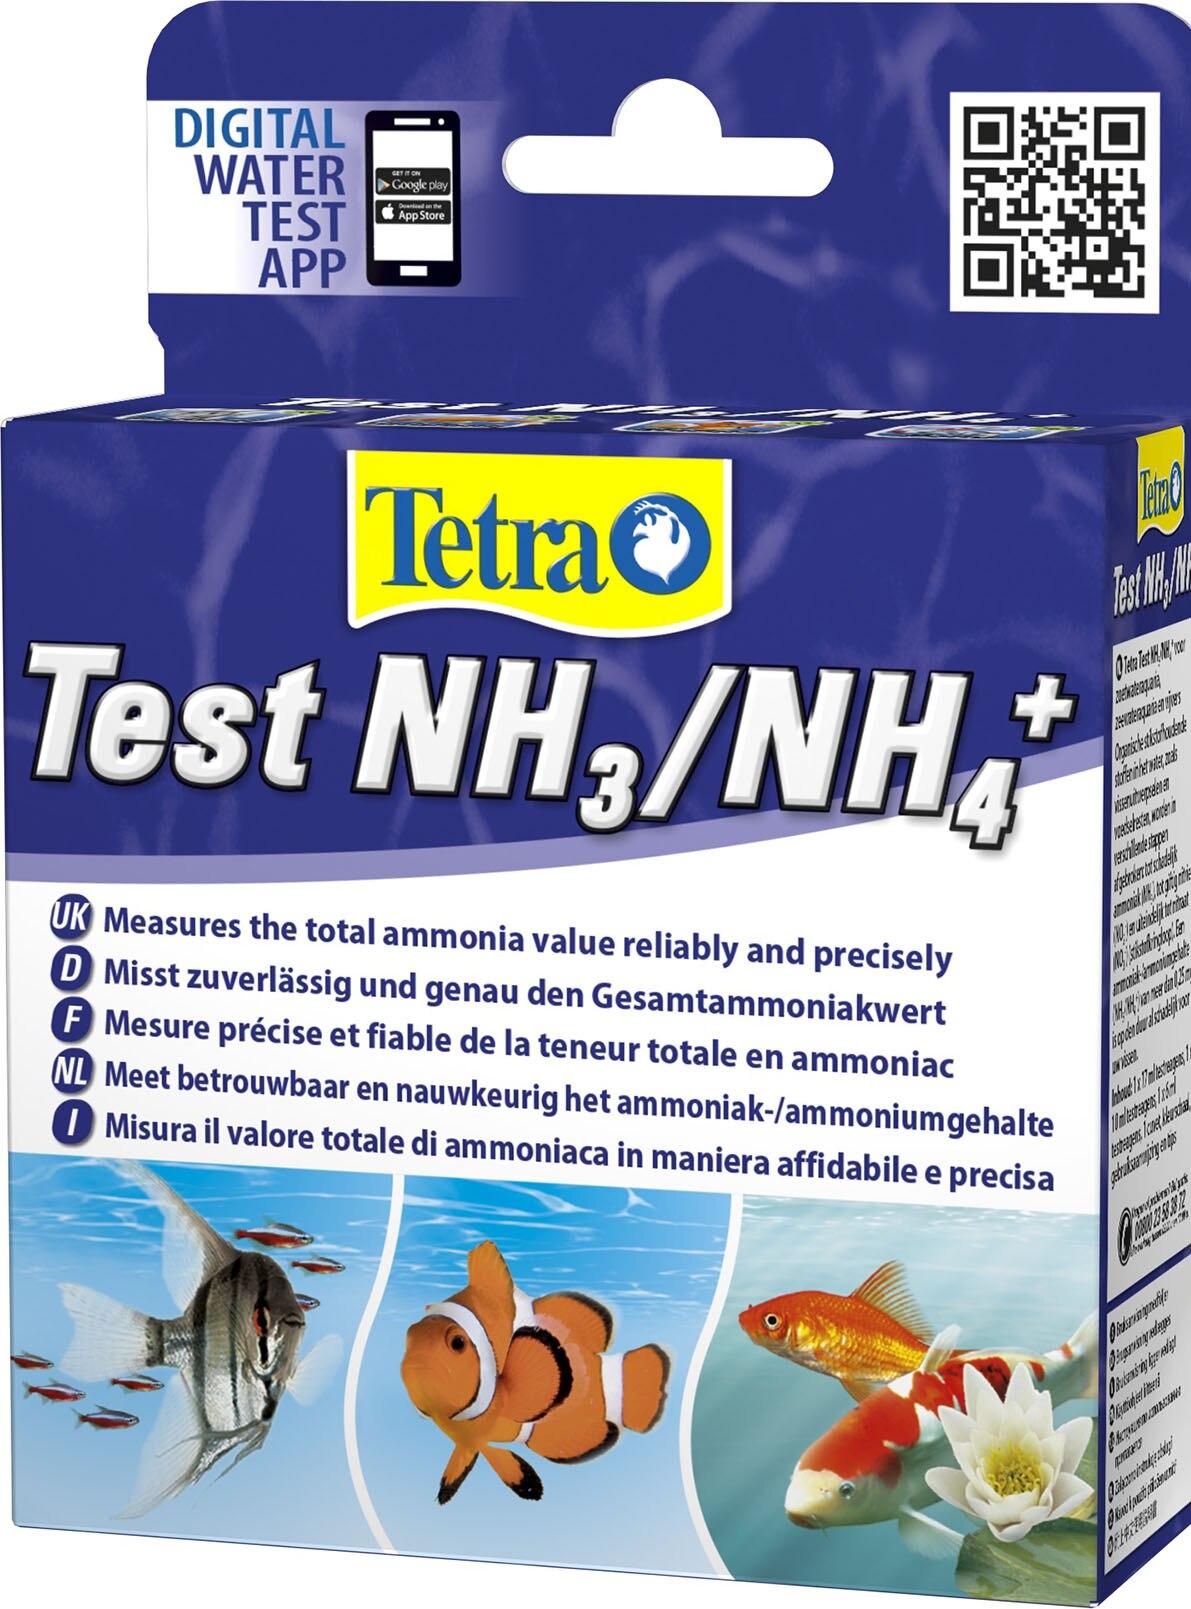 Test de Tetra NH3/NH4 para agua